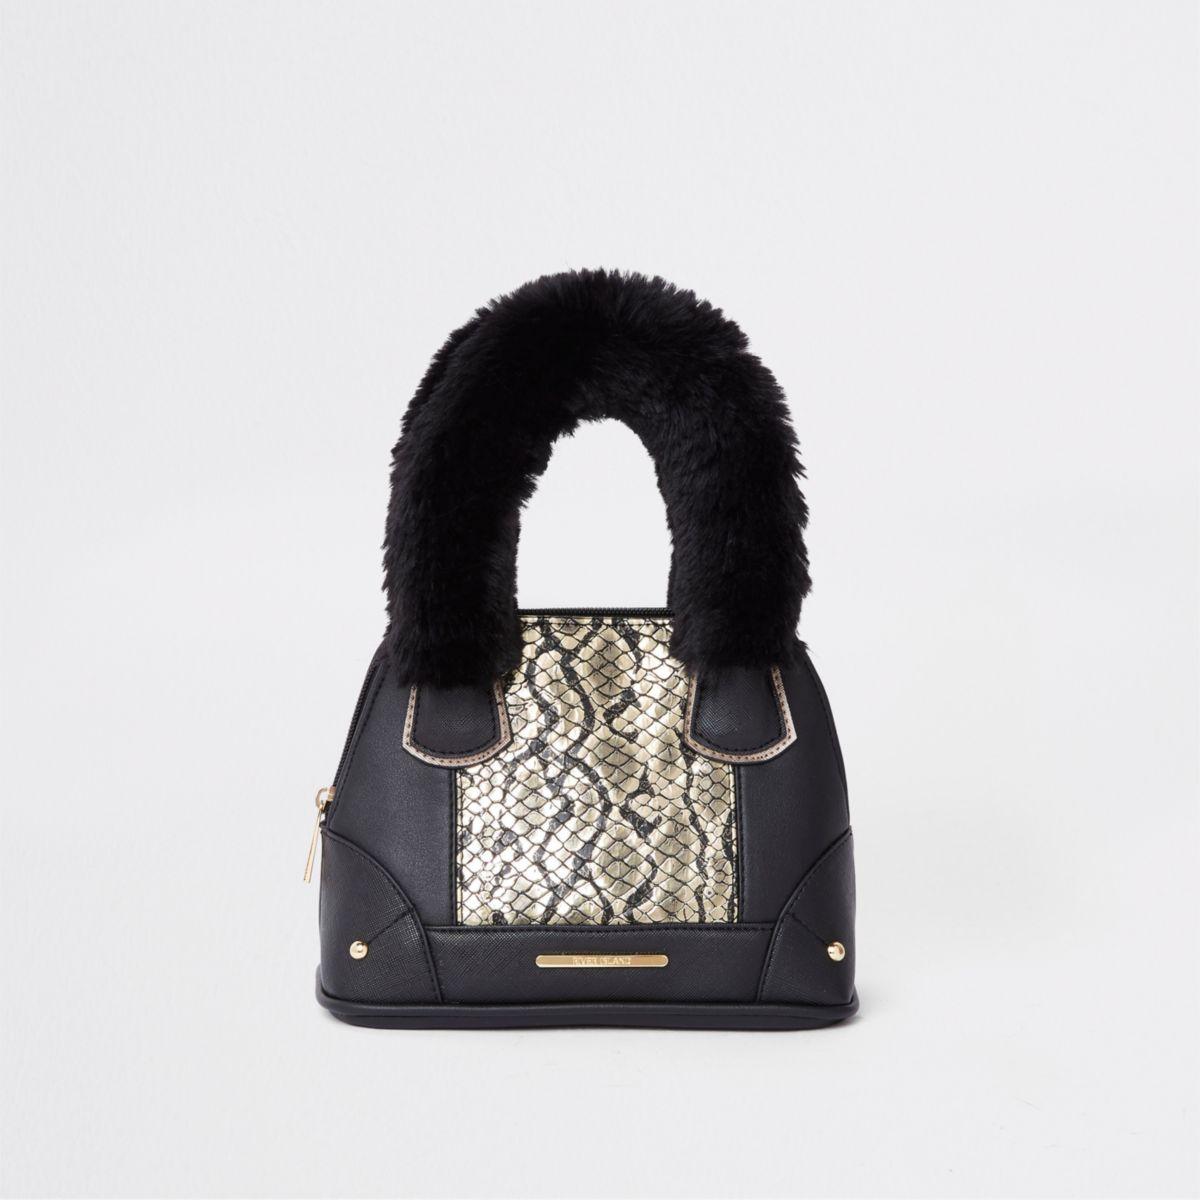 Girls black snake print faux tote bag